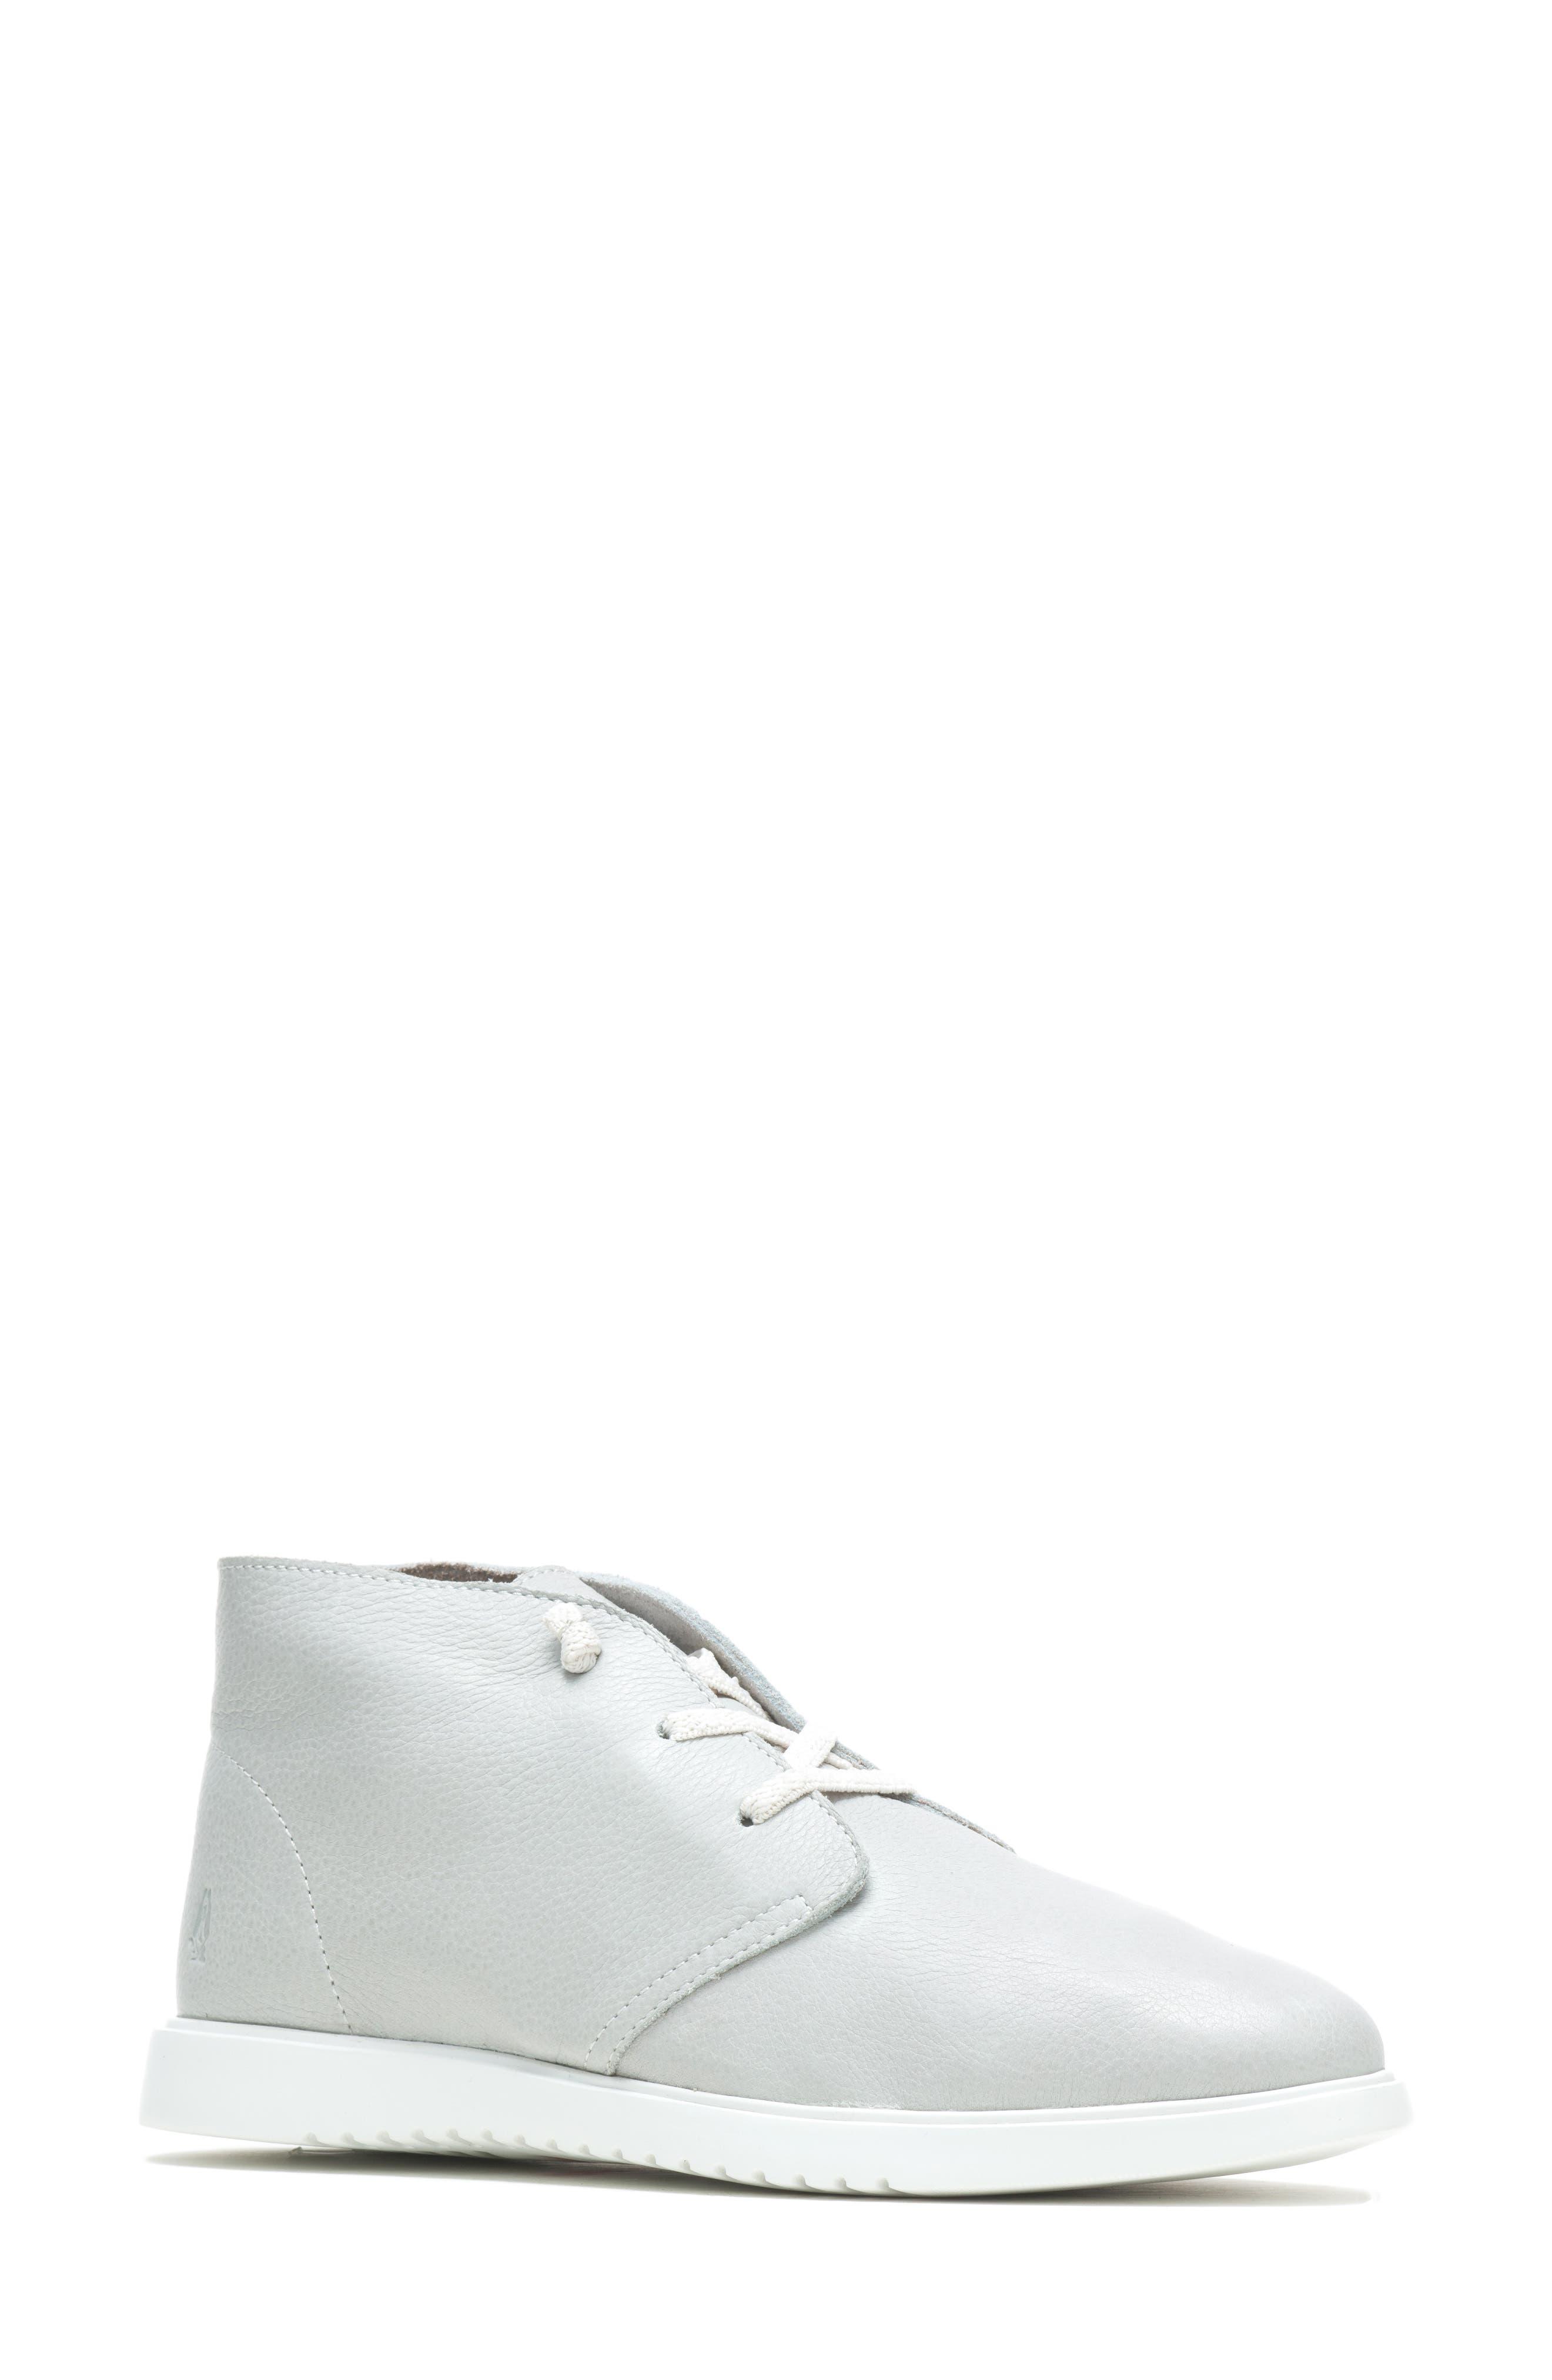 The Everyday Chukka Boot